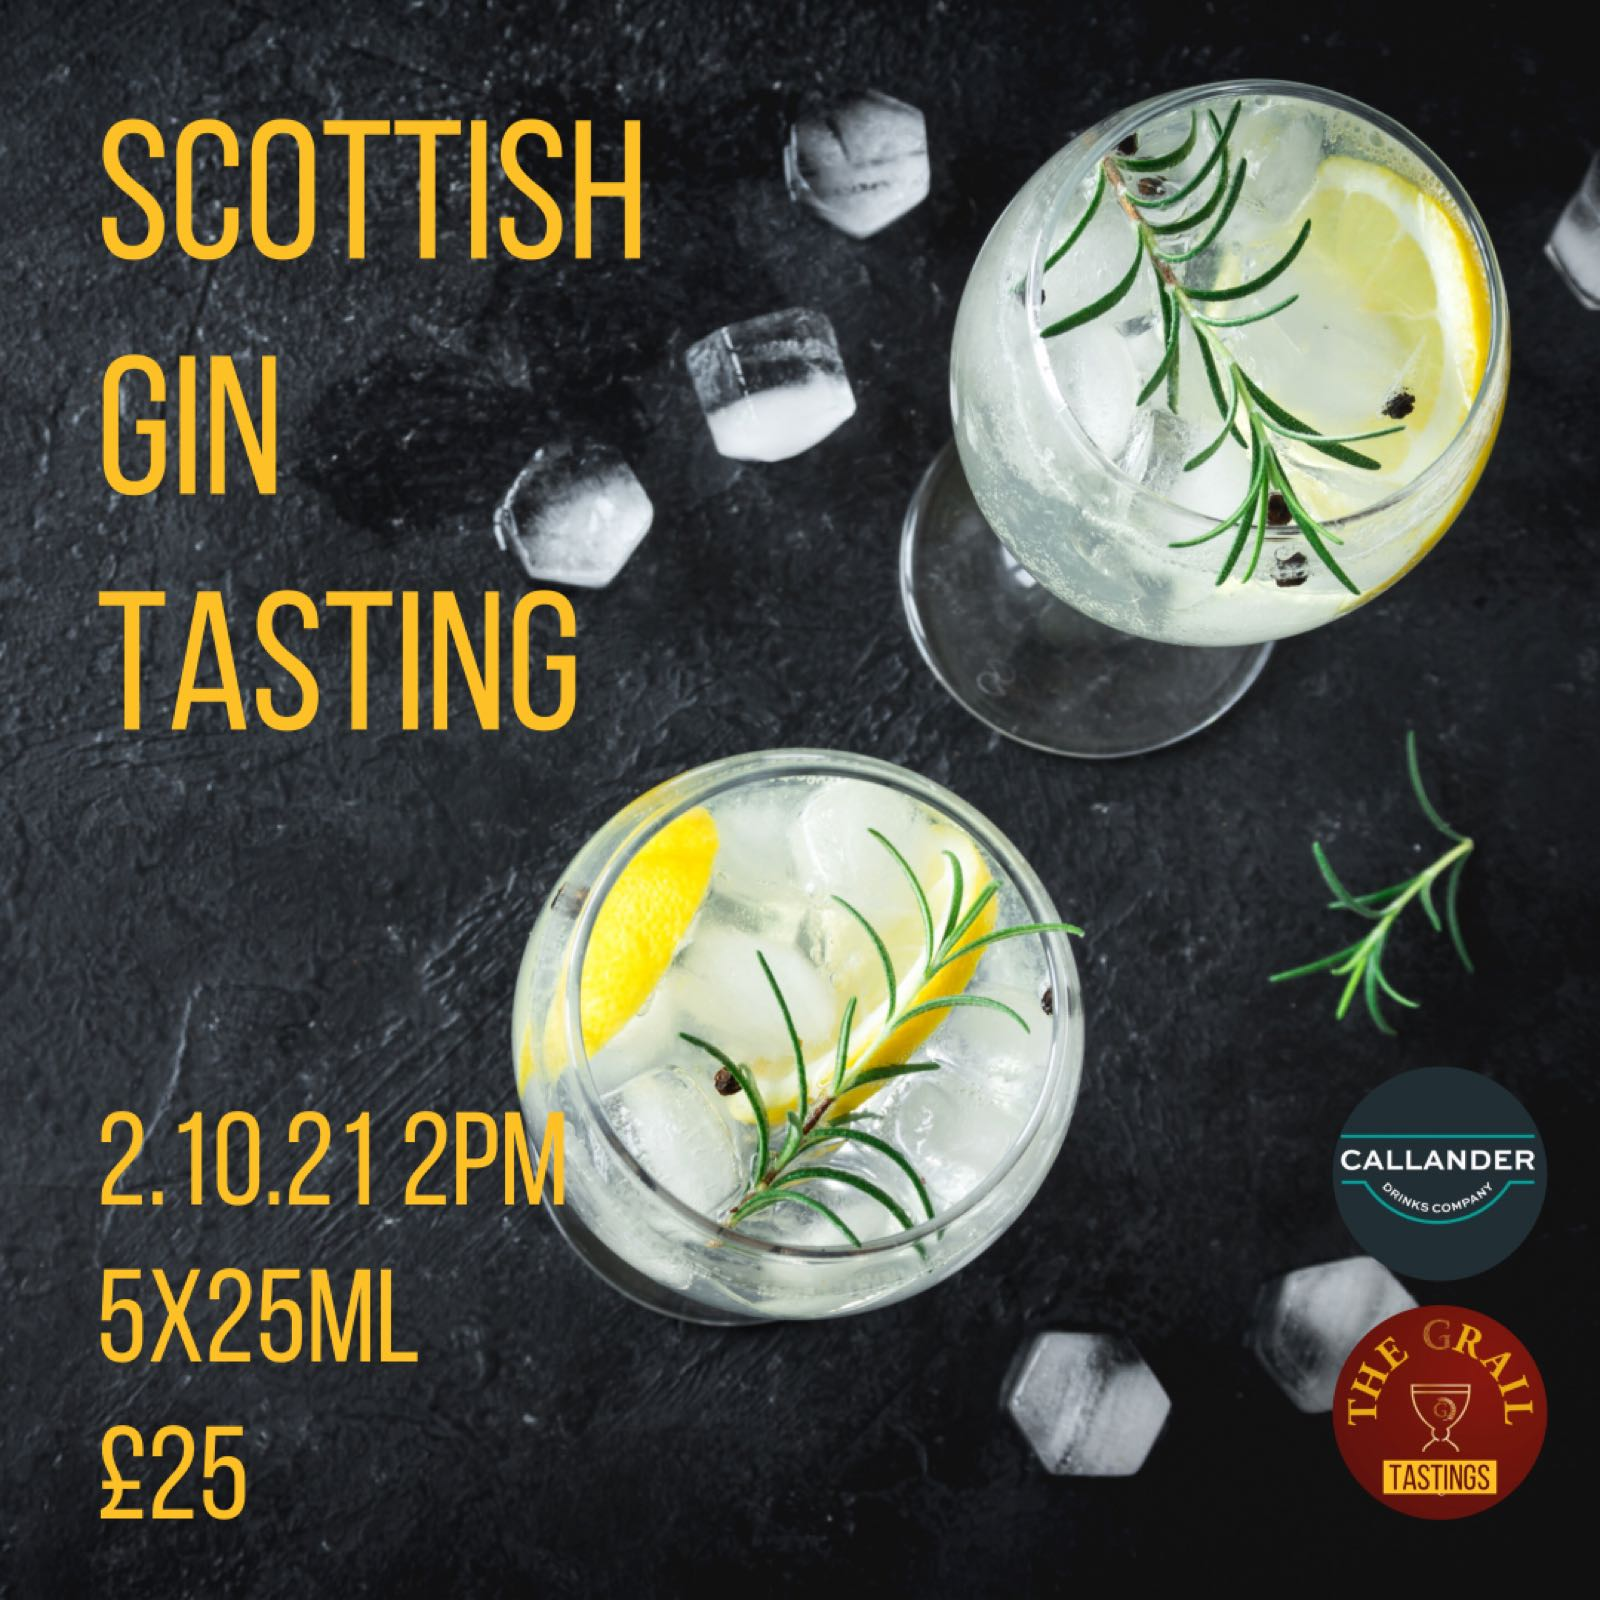 Scottish Gin Tasting 2.1021